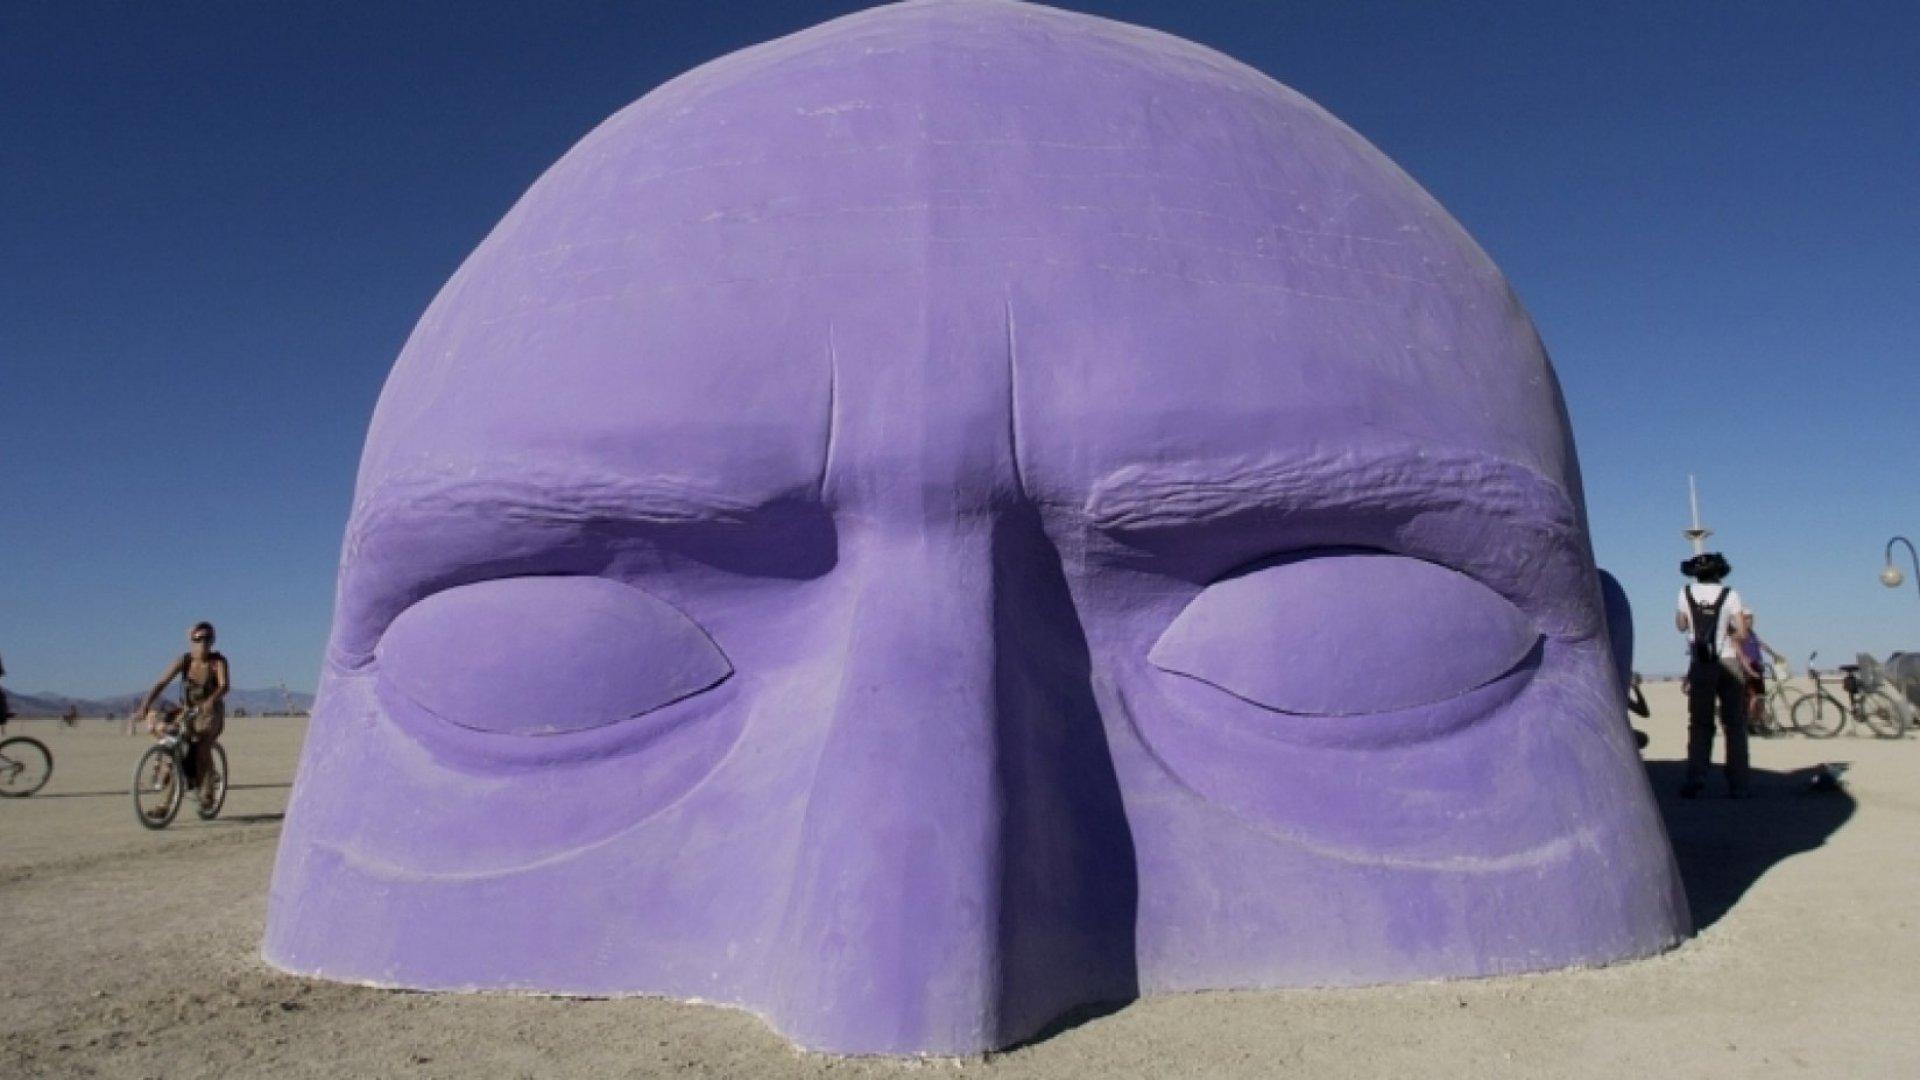 7 Feats of Crowdfunding and Entrepreneurship at Burning Man 2015